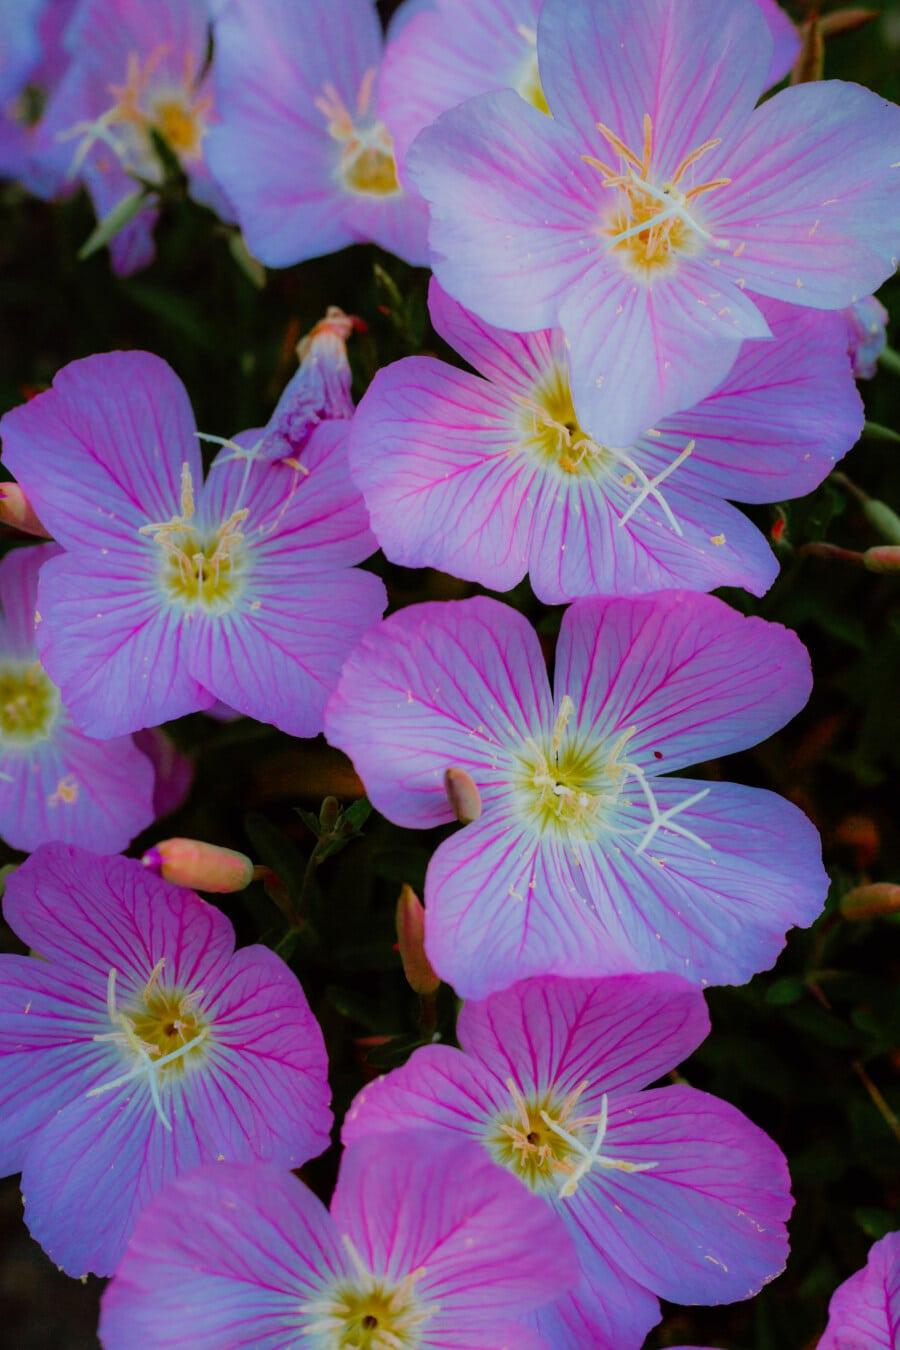 petals, pollen, close-up, pistil, bright, pinkish, flowers, flower, pink, herb